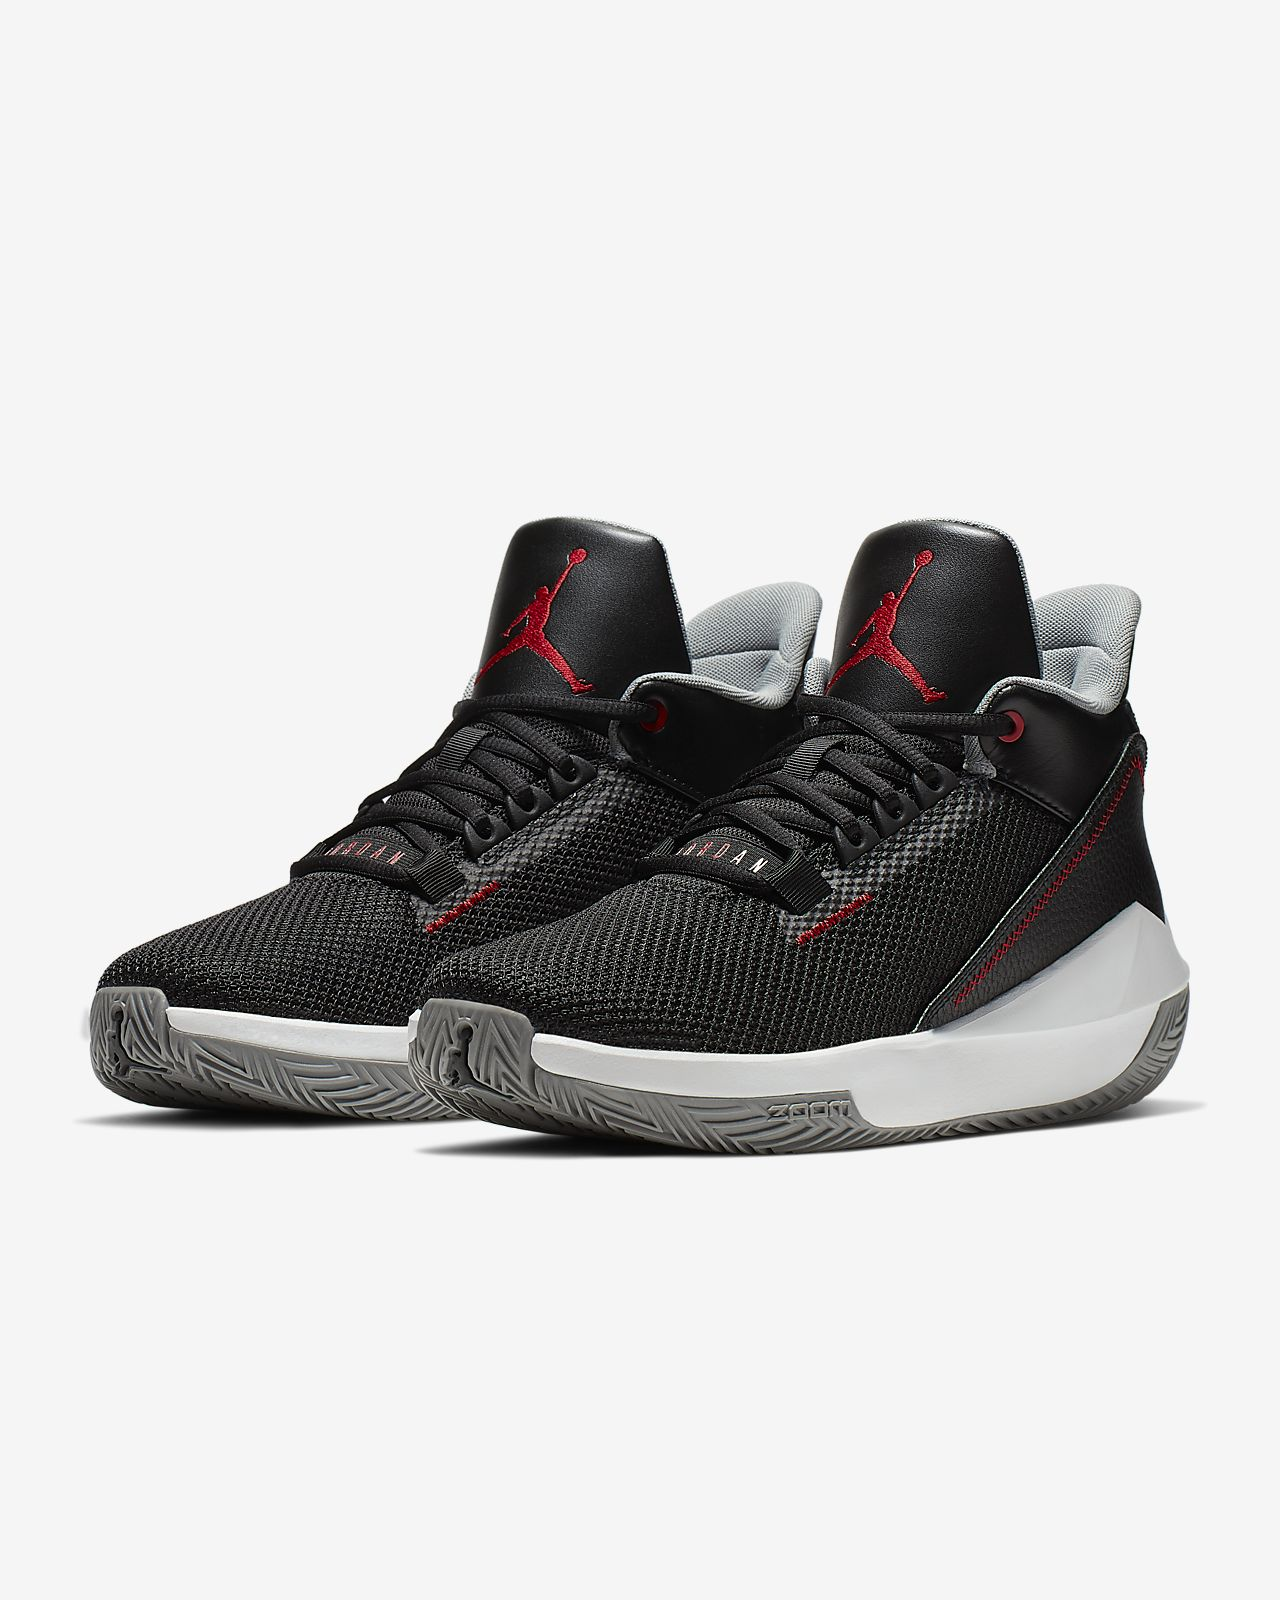 check out 41028 66e3f Low Resolution Jordan 2x3 Basketball Shoe Jordan 2x3 Basketball Shoe